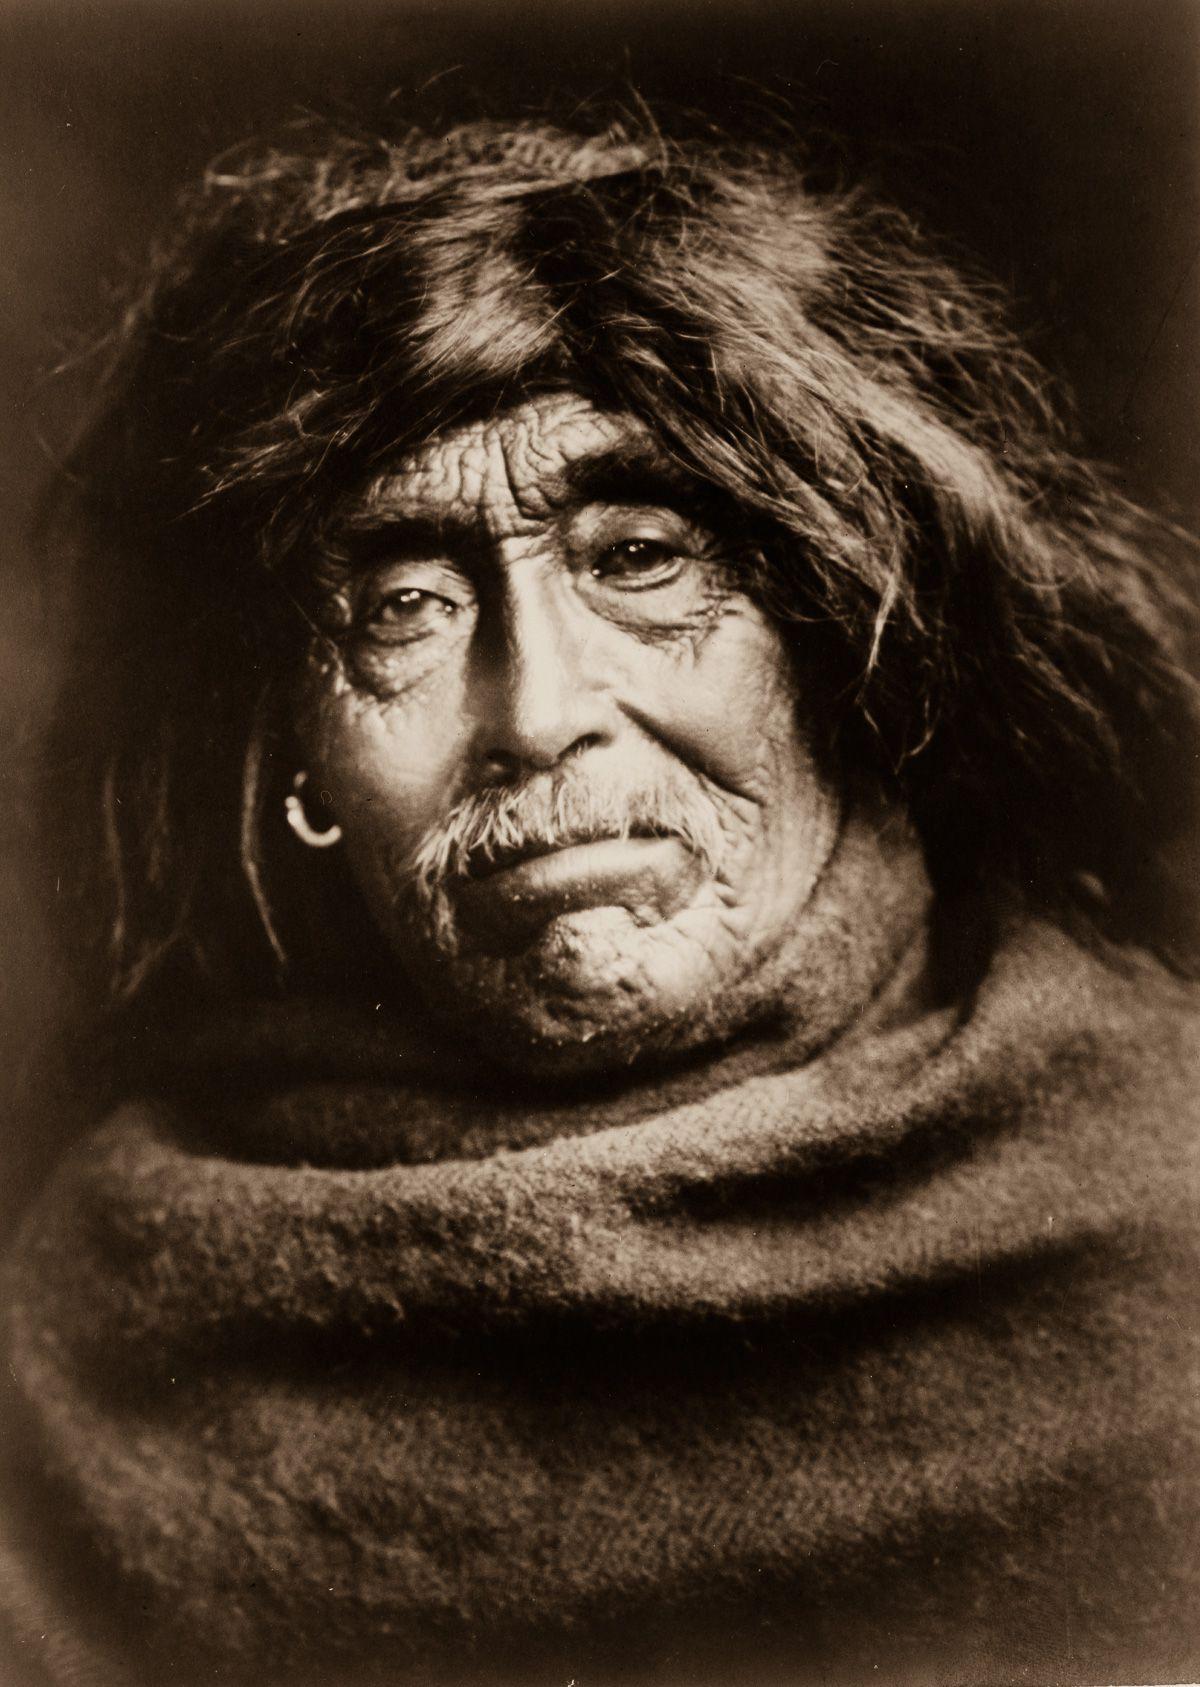 Mowakiu, a Tsawatenok man,  1914.  ©EDWARD S. CURTIS/LIBRARY OF CONGRESS